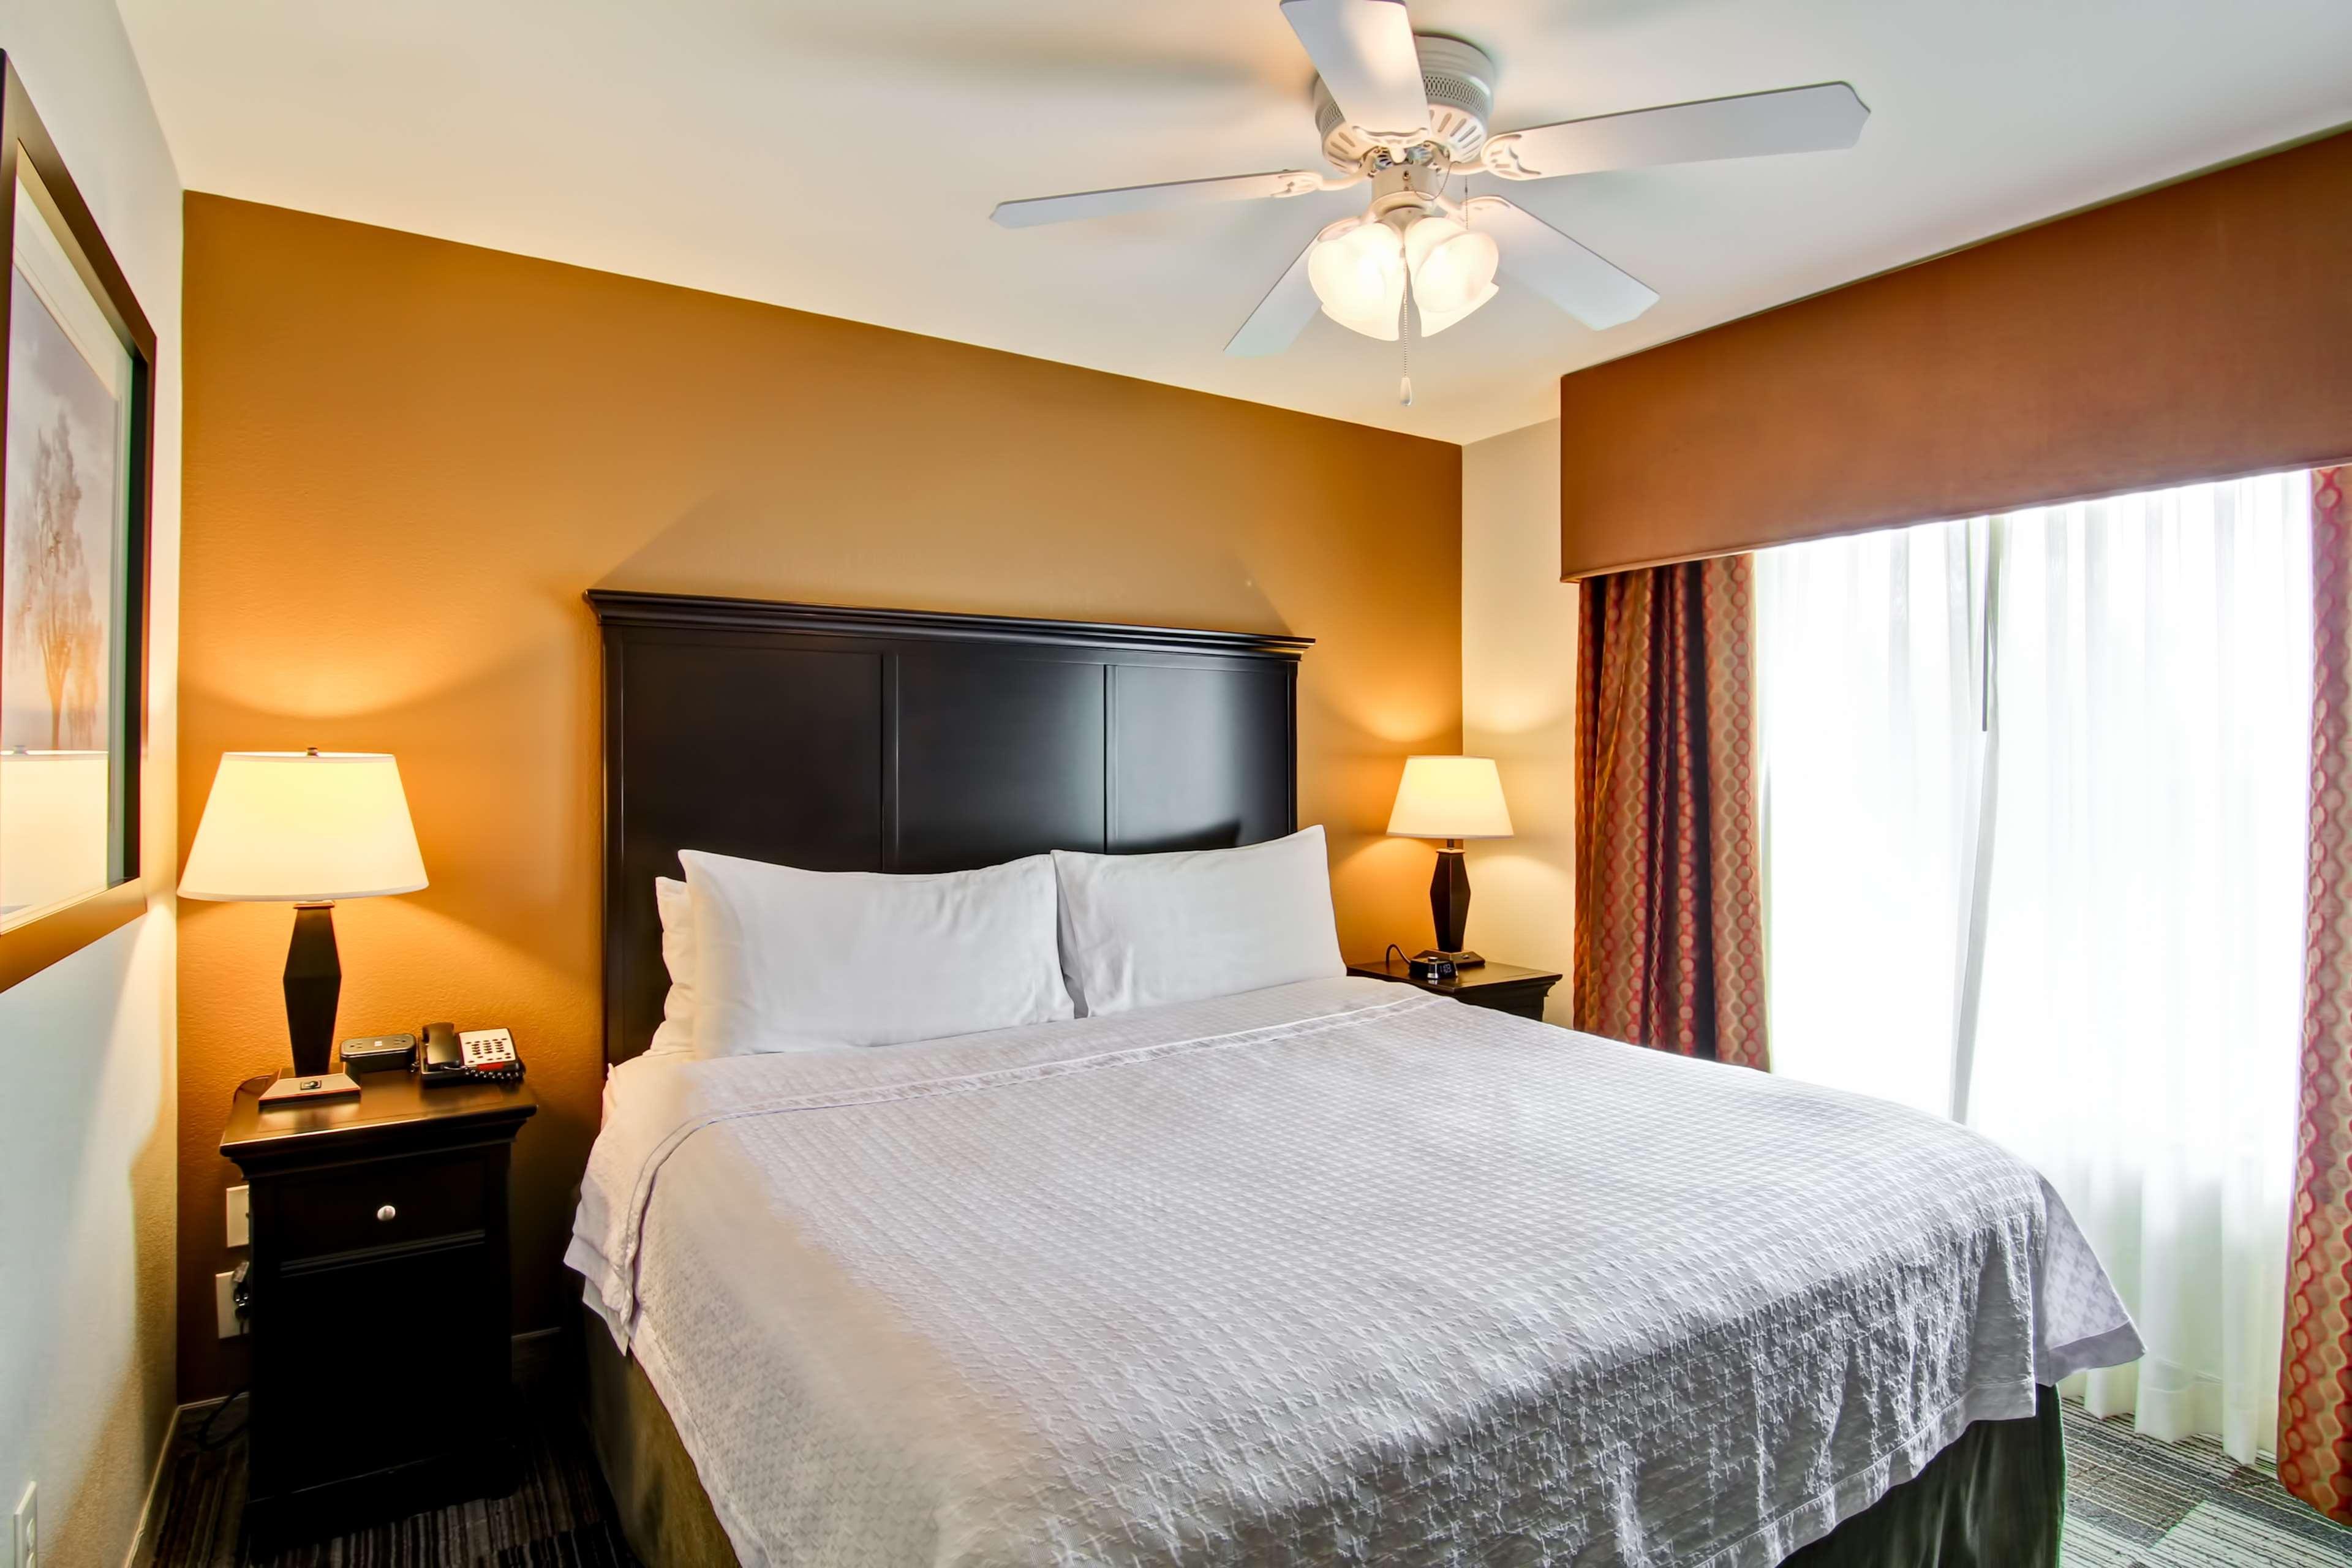 Homewood Suites by Hilton Cincinnati Airport South-Florence image 19